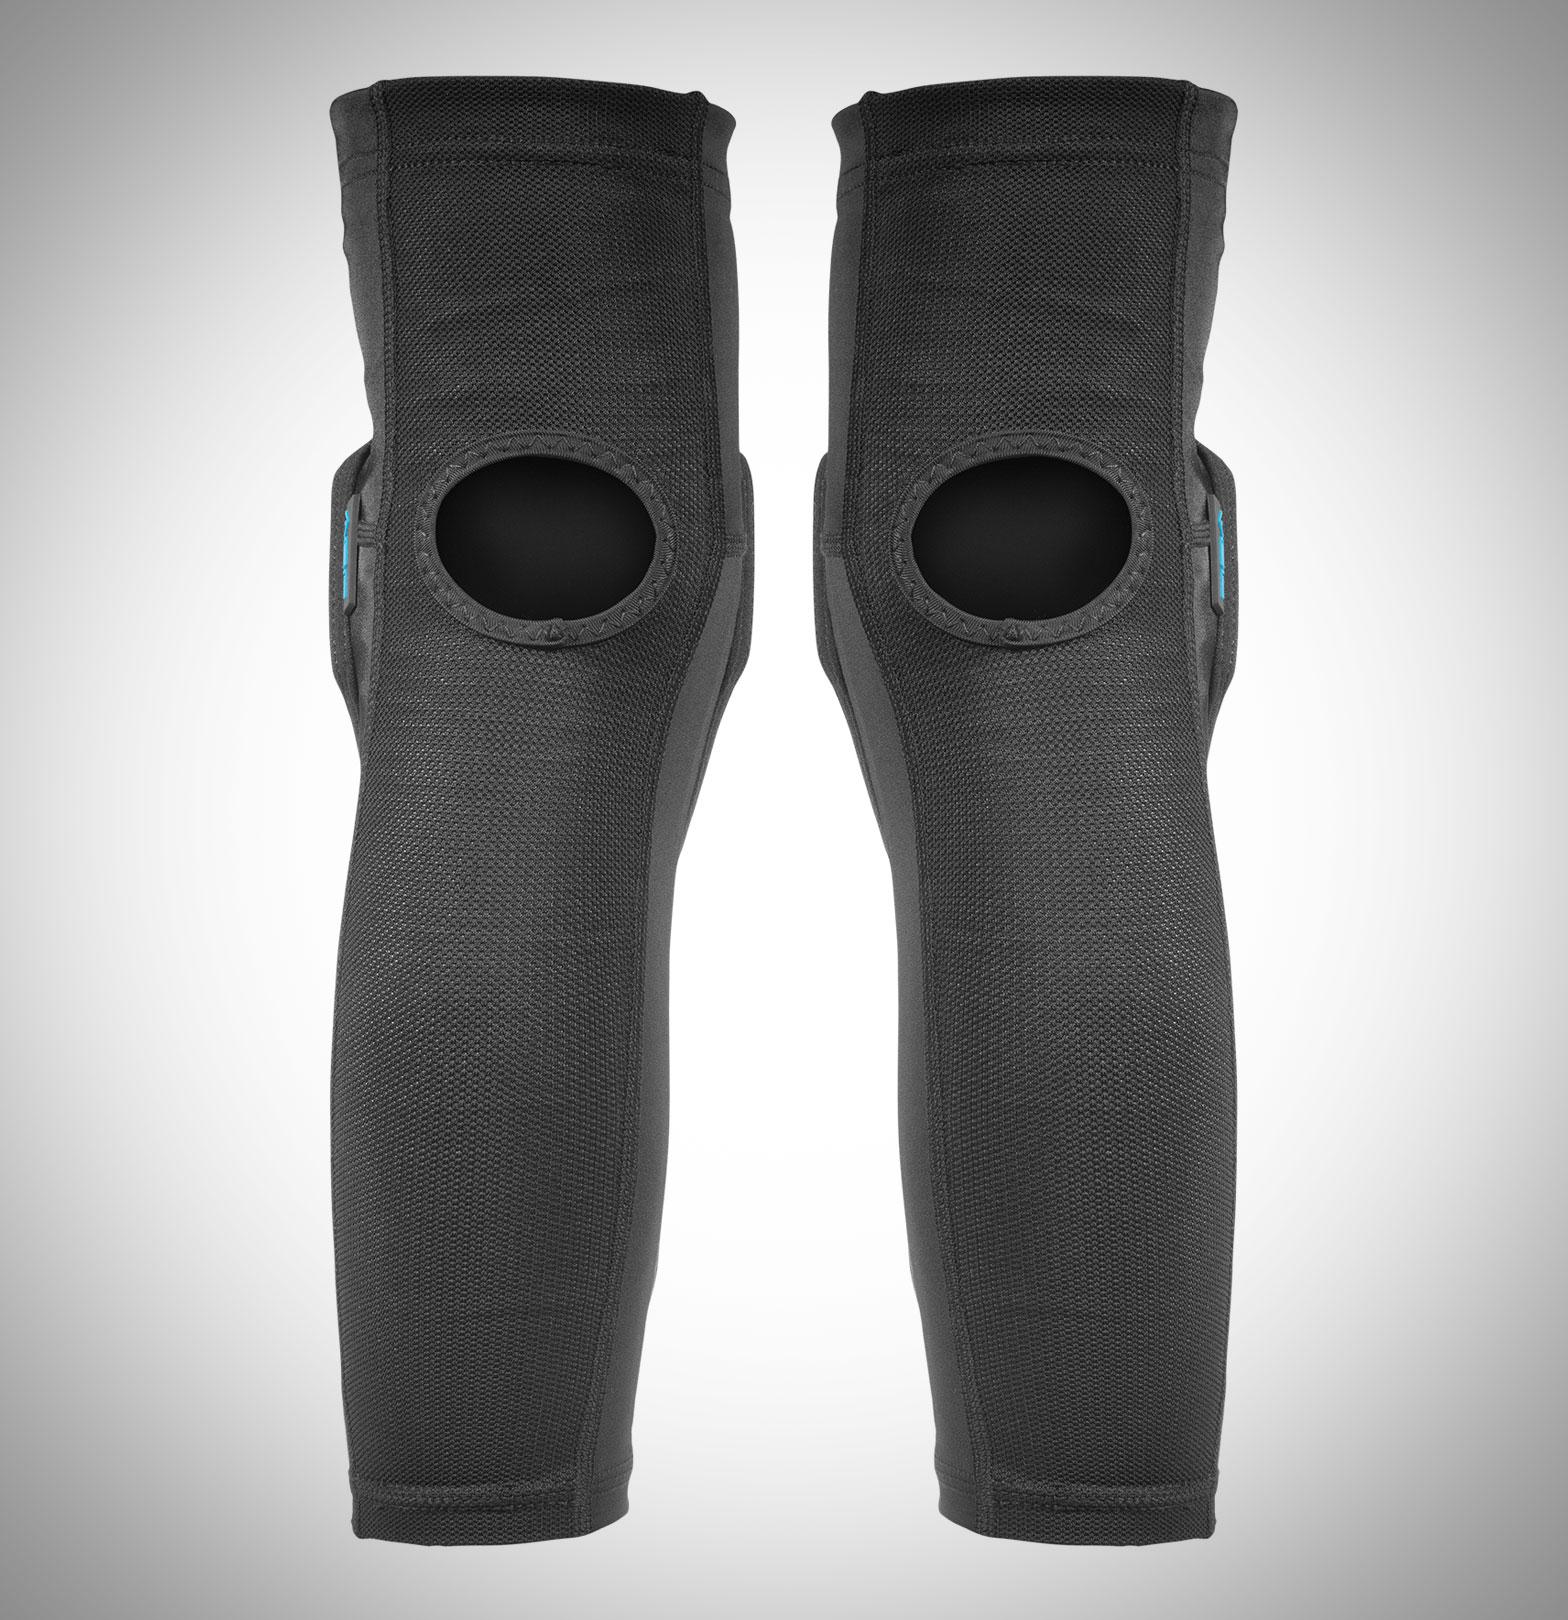 TSG Dermis Pro A Knee-Sleeves